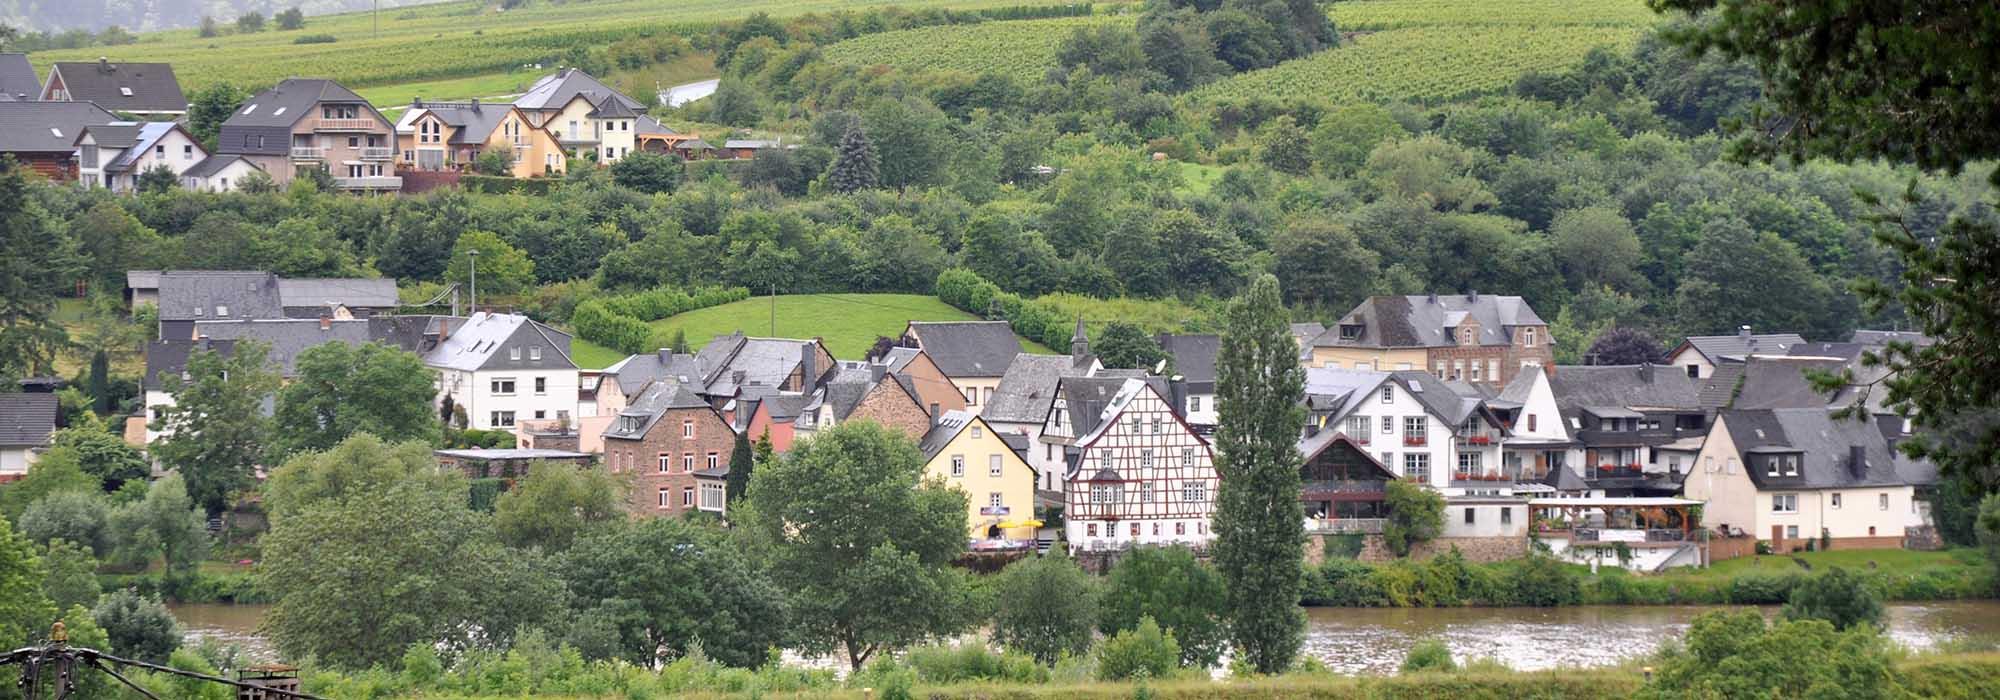 DSC_0822Senheim